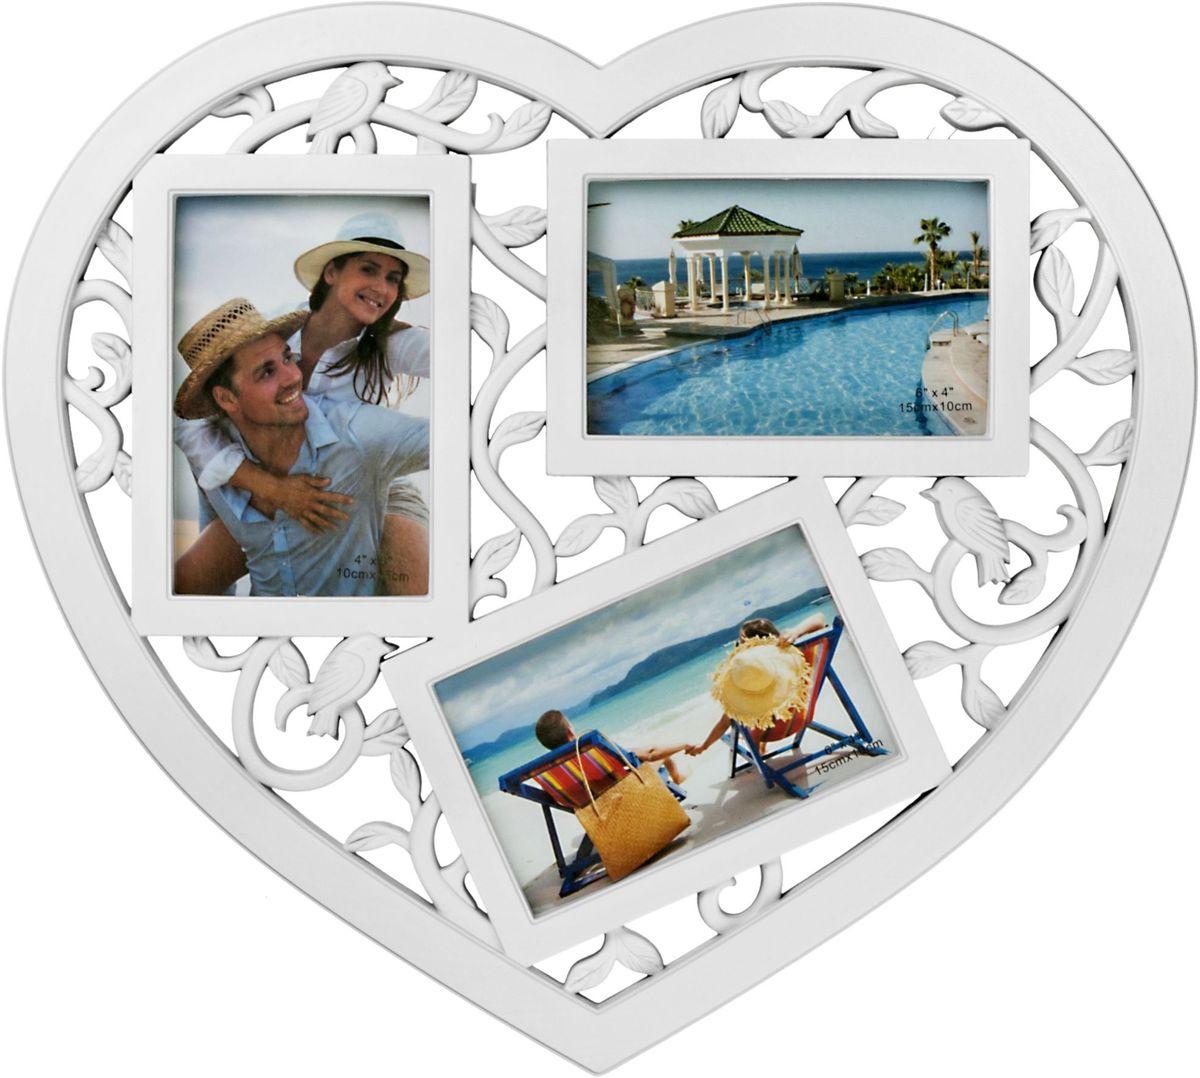 Коллаж Platinum Сердце, цвет: белый, 3 фоторамки. BIN-1123678BIN-1123678-White-БелыйПластиковый коллаж с 3 фото 10х15 см.